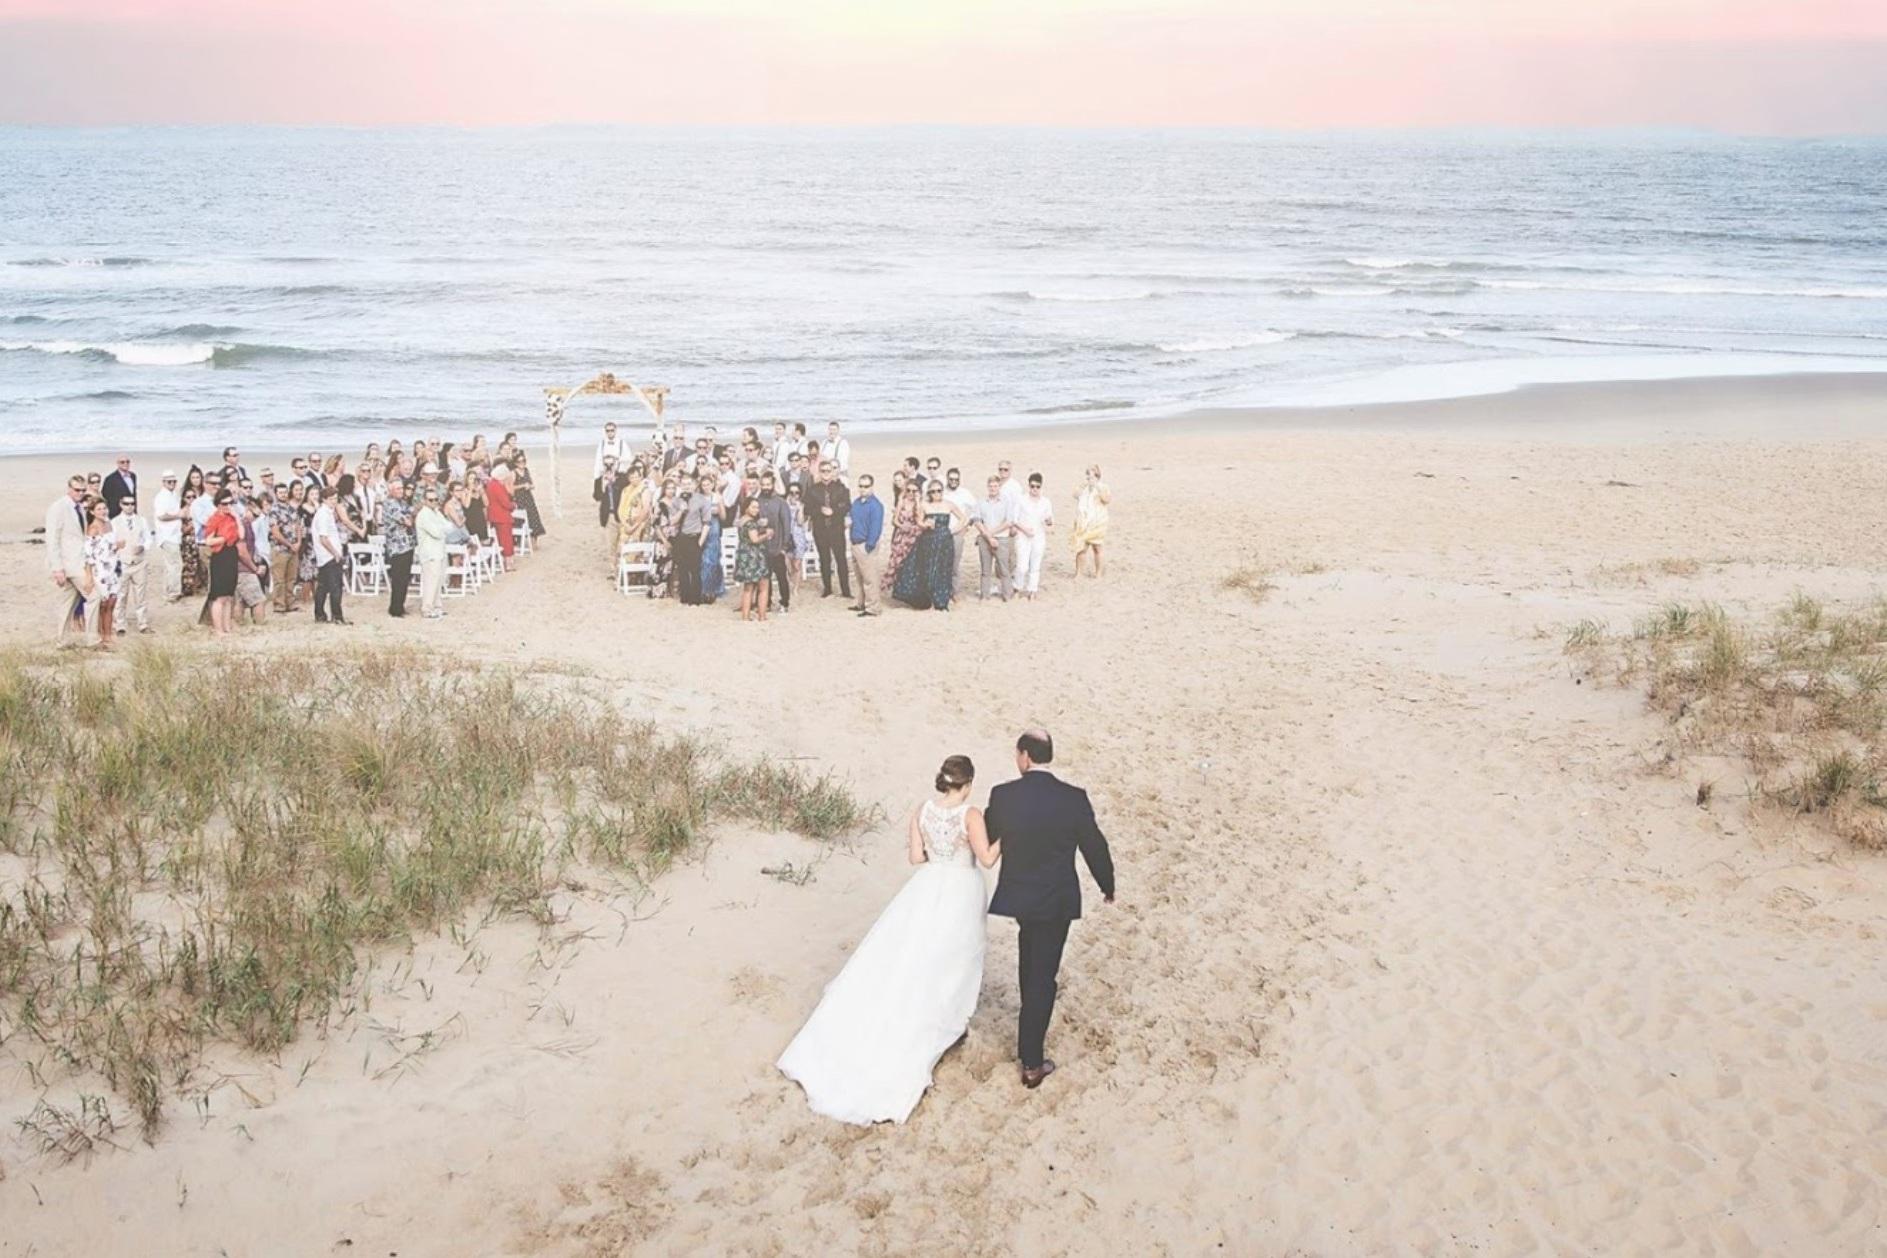 Alex+%2B+Corrine+-+Virginia+Beach+Wedding.jpg